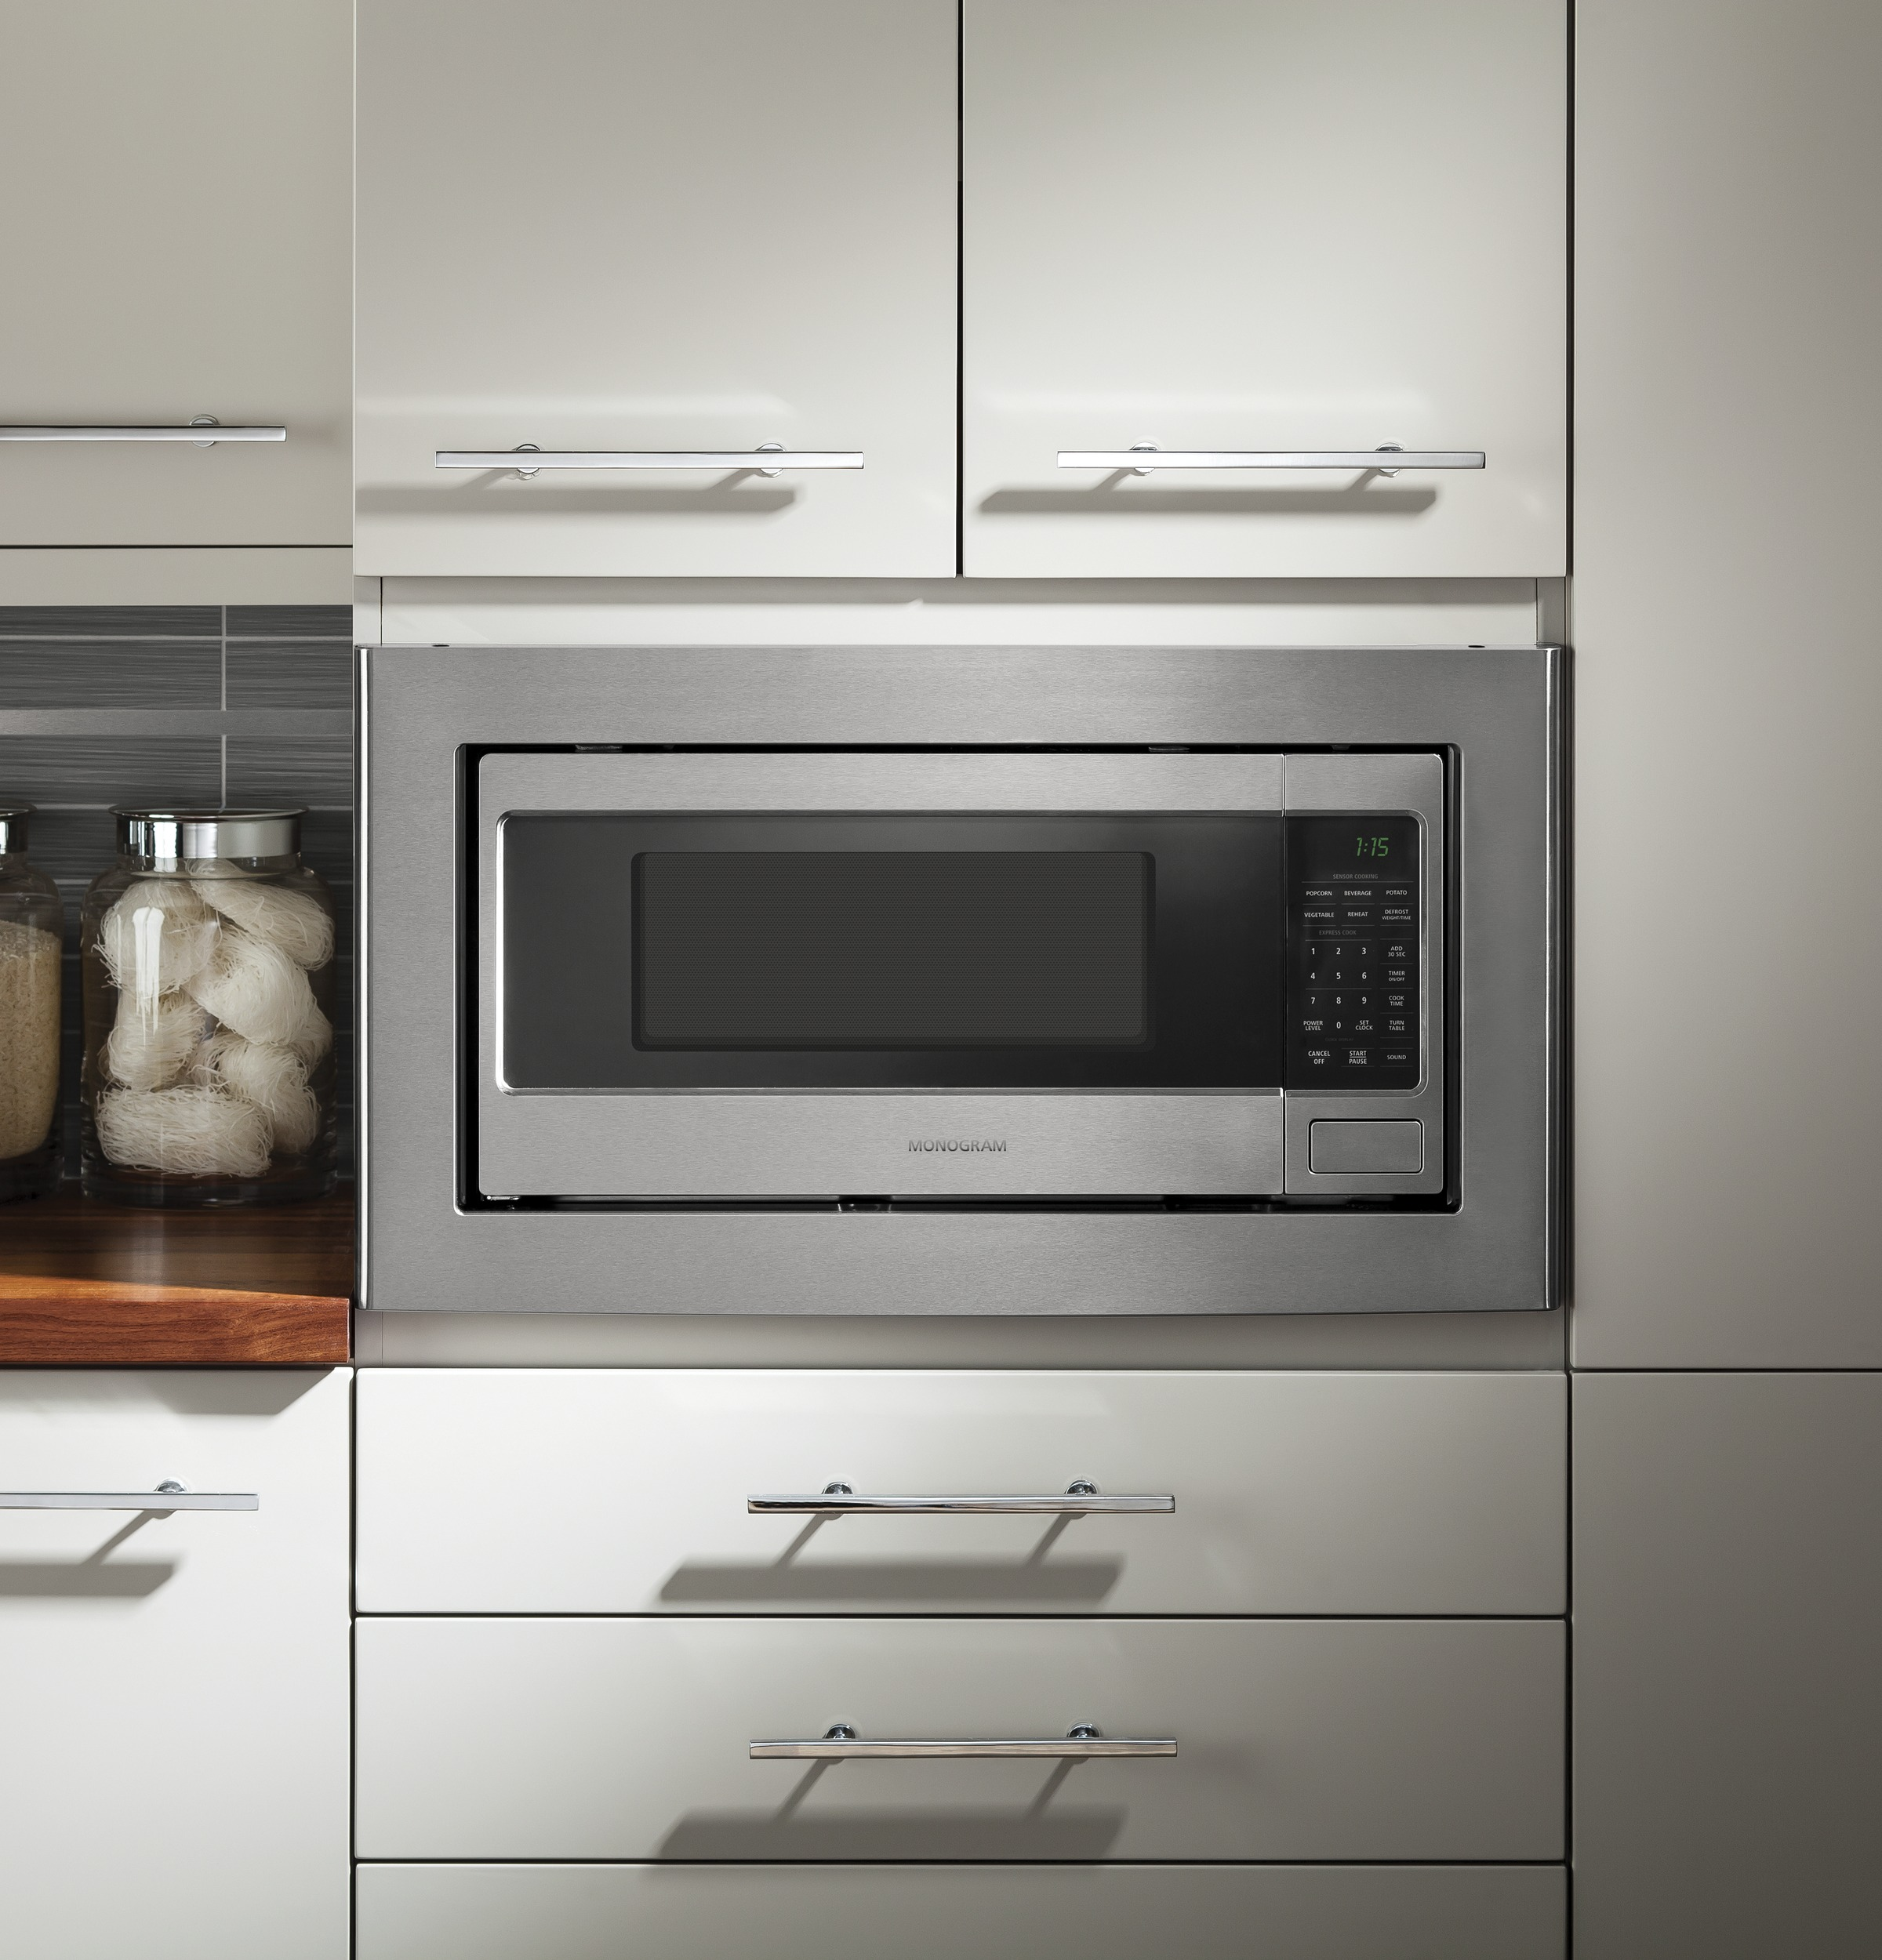 Model: ZEM115SJSS | Monogram Monogram 1.1 Cu. Ft. Countertop Microwave Oven